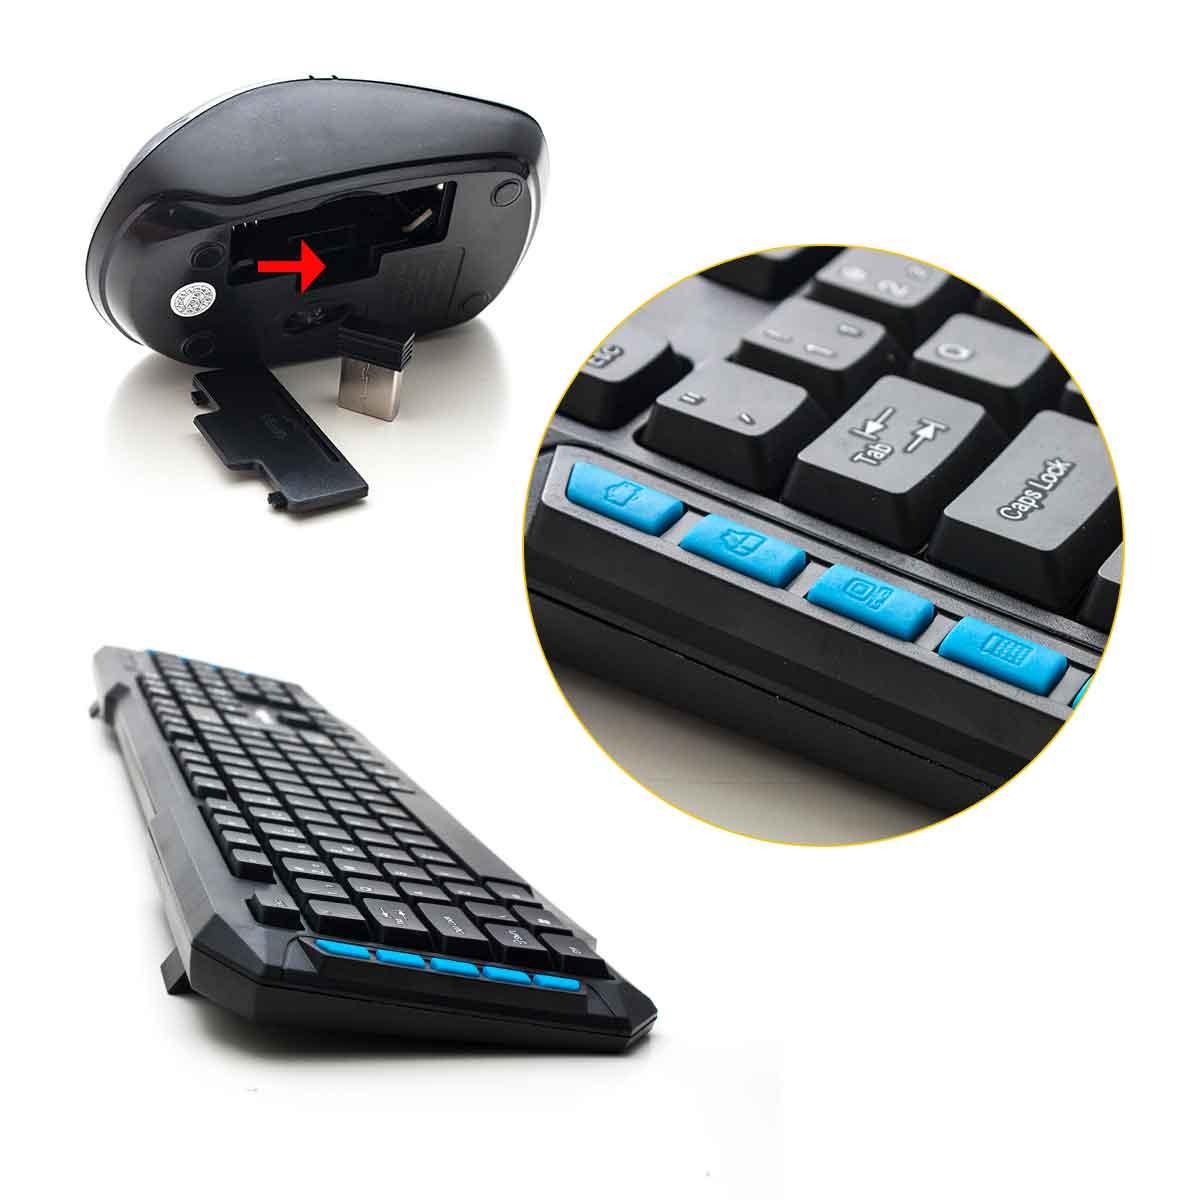 Kit Teclado Mouse Sem Fio 1000dpi Wireless Gamer 2.4ghz